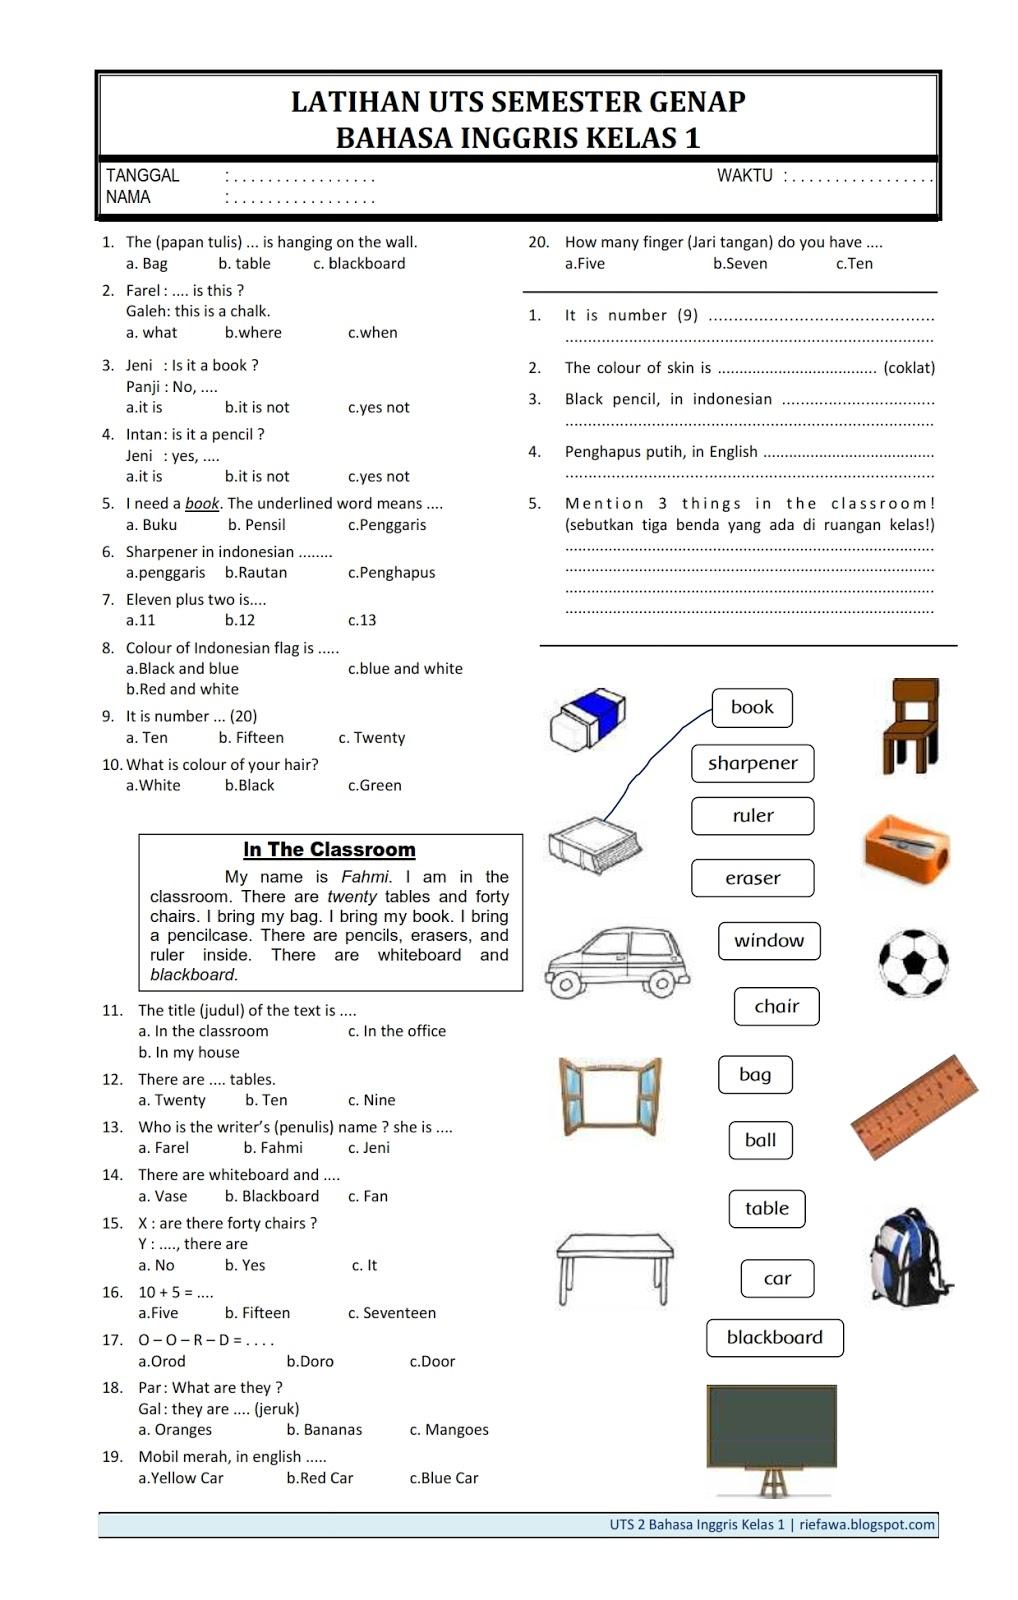 13/05/2020· soal uas matematika kelas 12 semester 1 pilihan ganda k13 +jawaban oleh anas ilham diposting pada mei 13, 2020. Contoh Soal Uts Bahasa Inggris Kelas 2 Sd Semester 2017